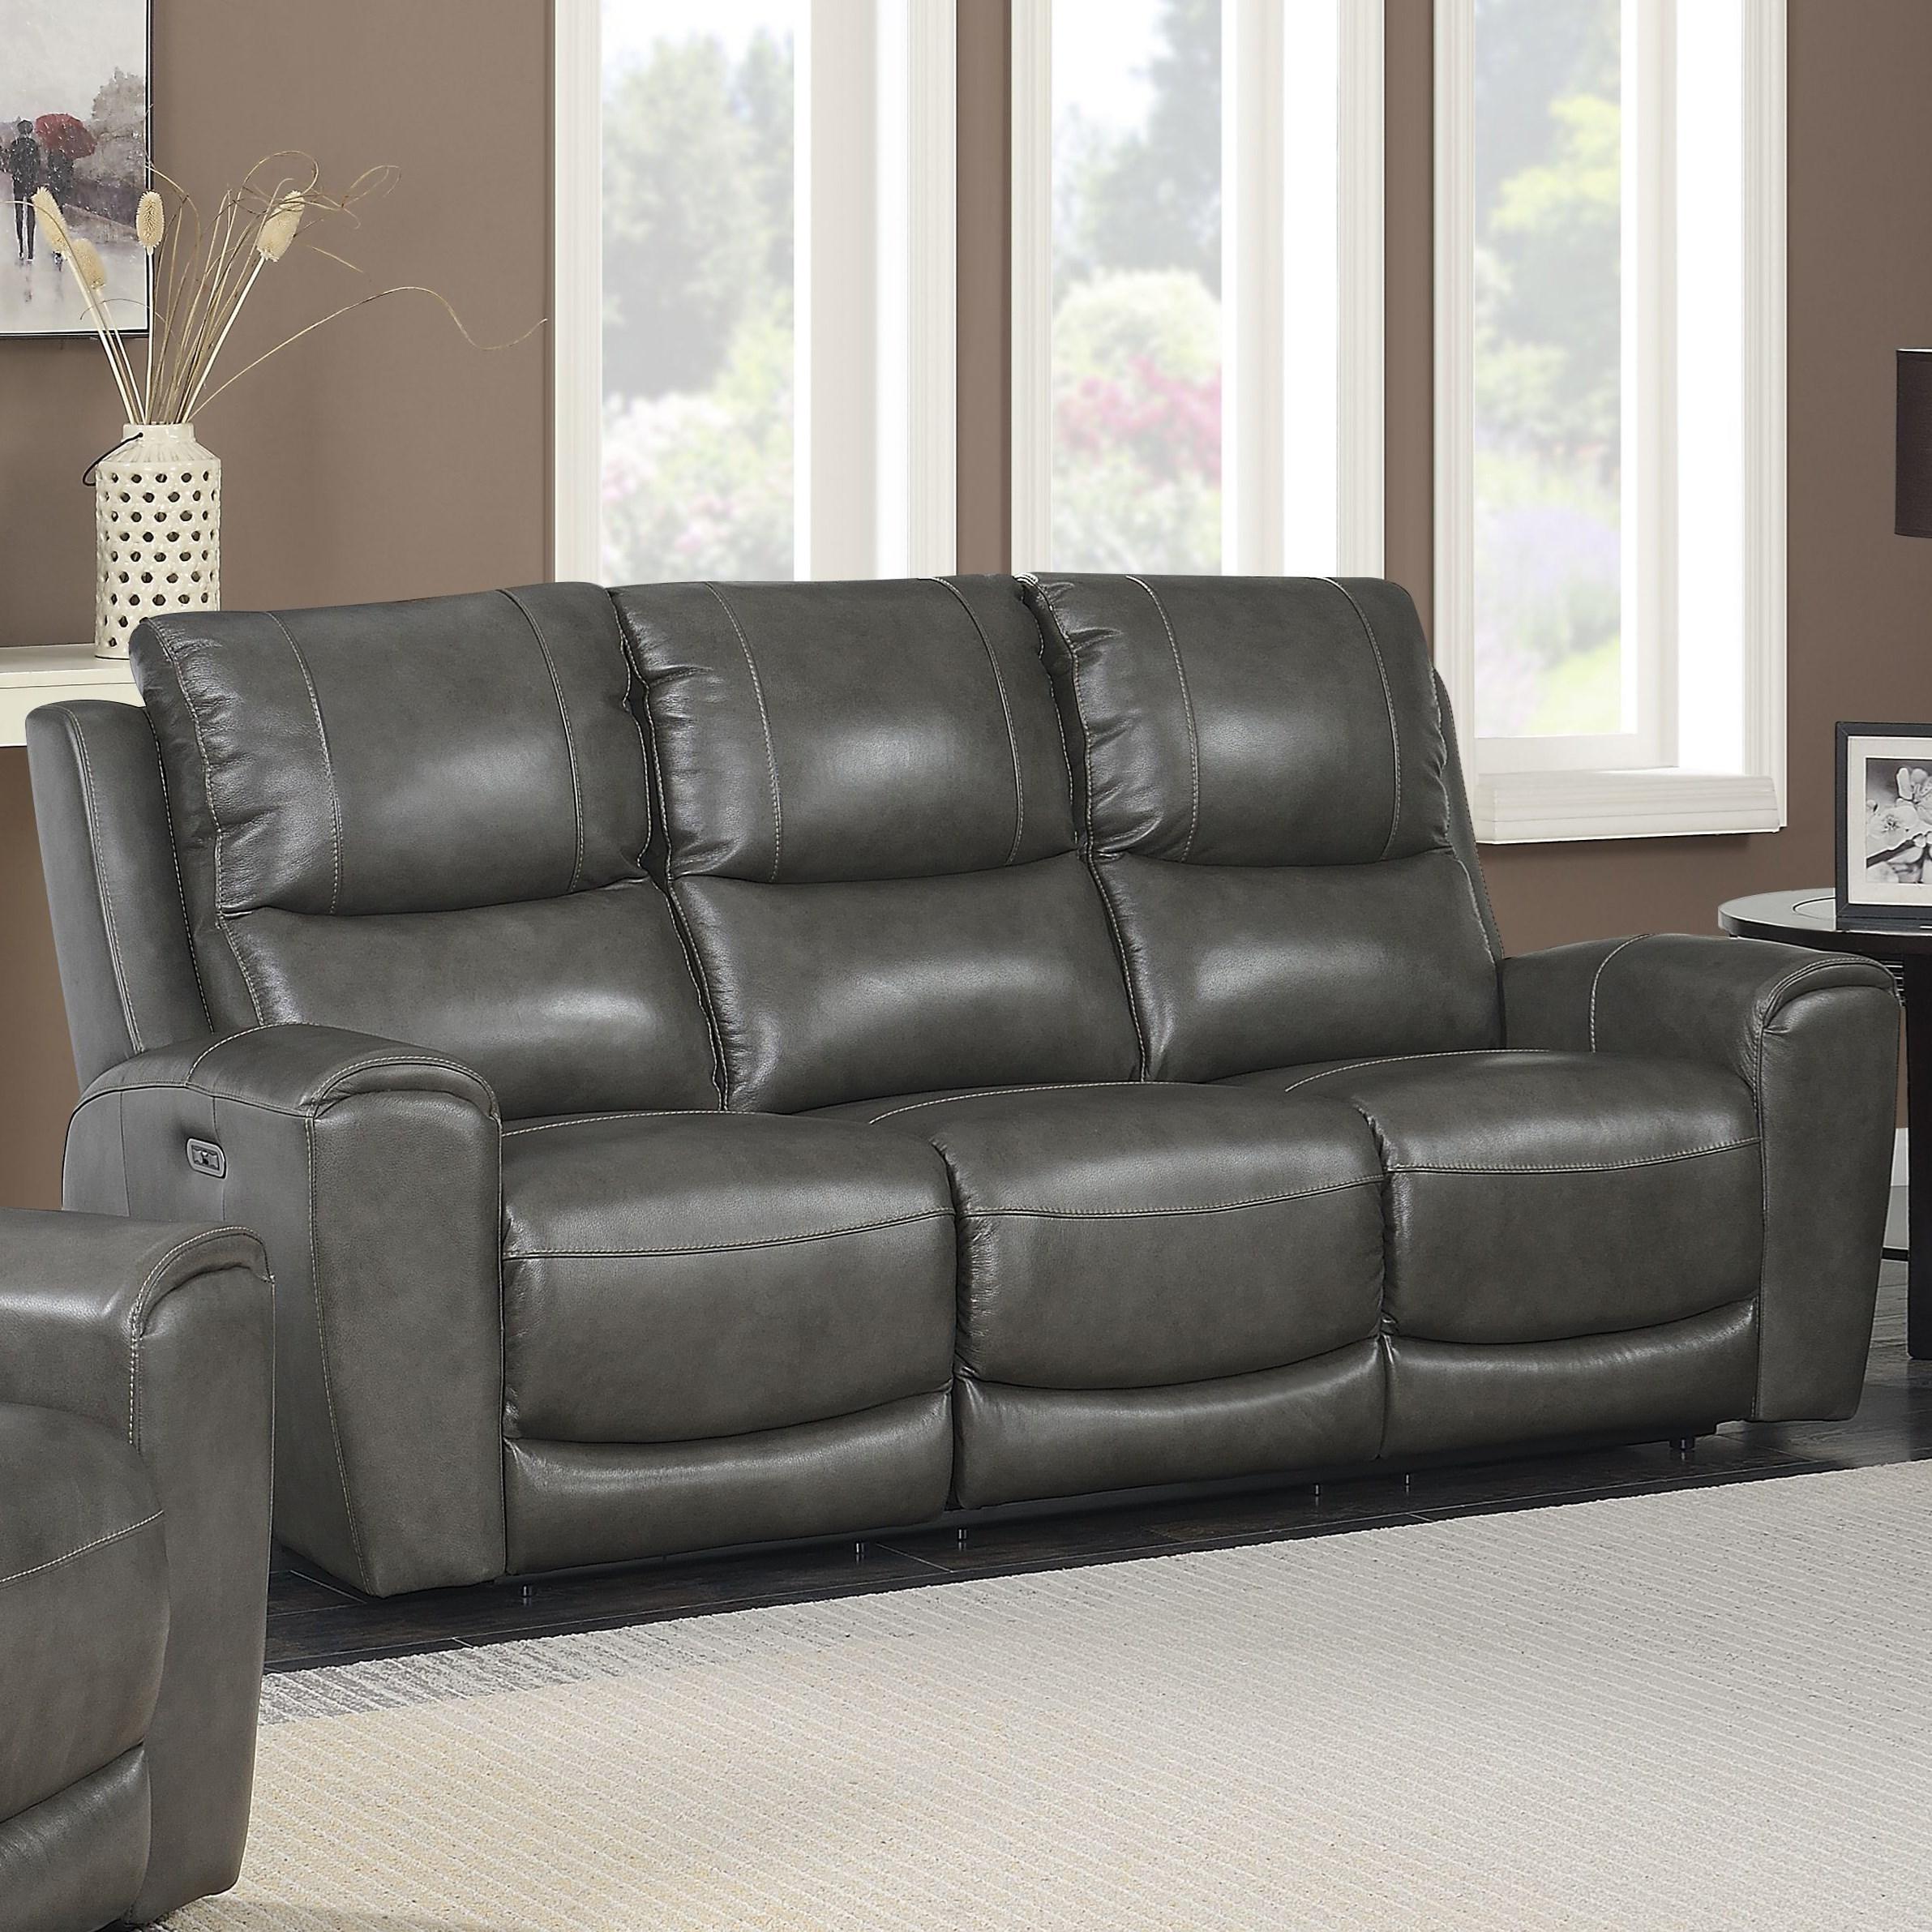 Laurel Power Recliner Sofa